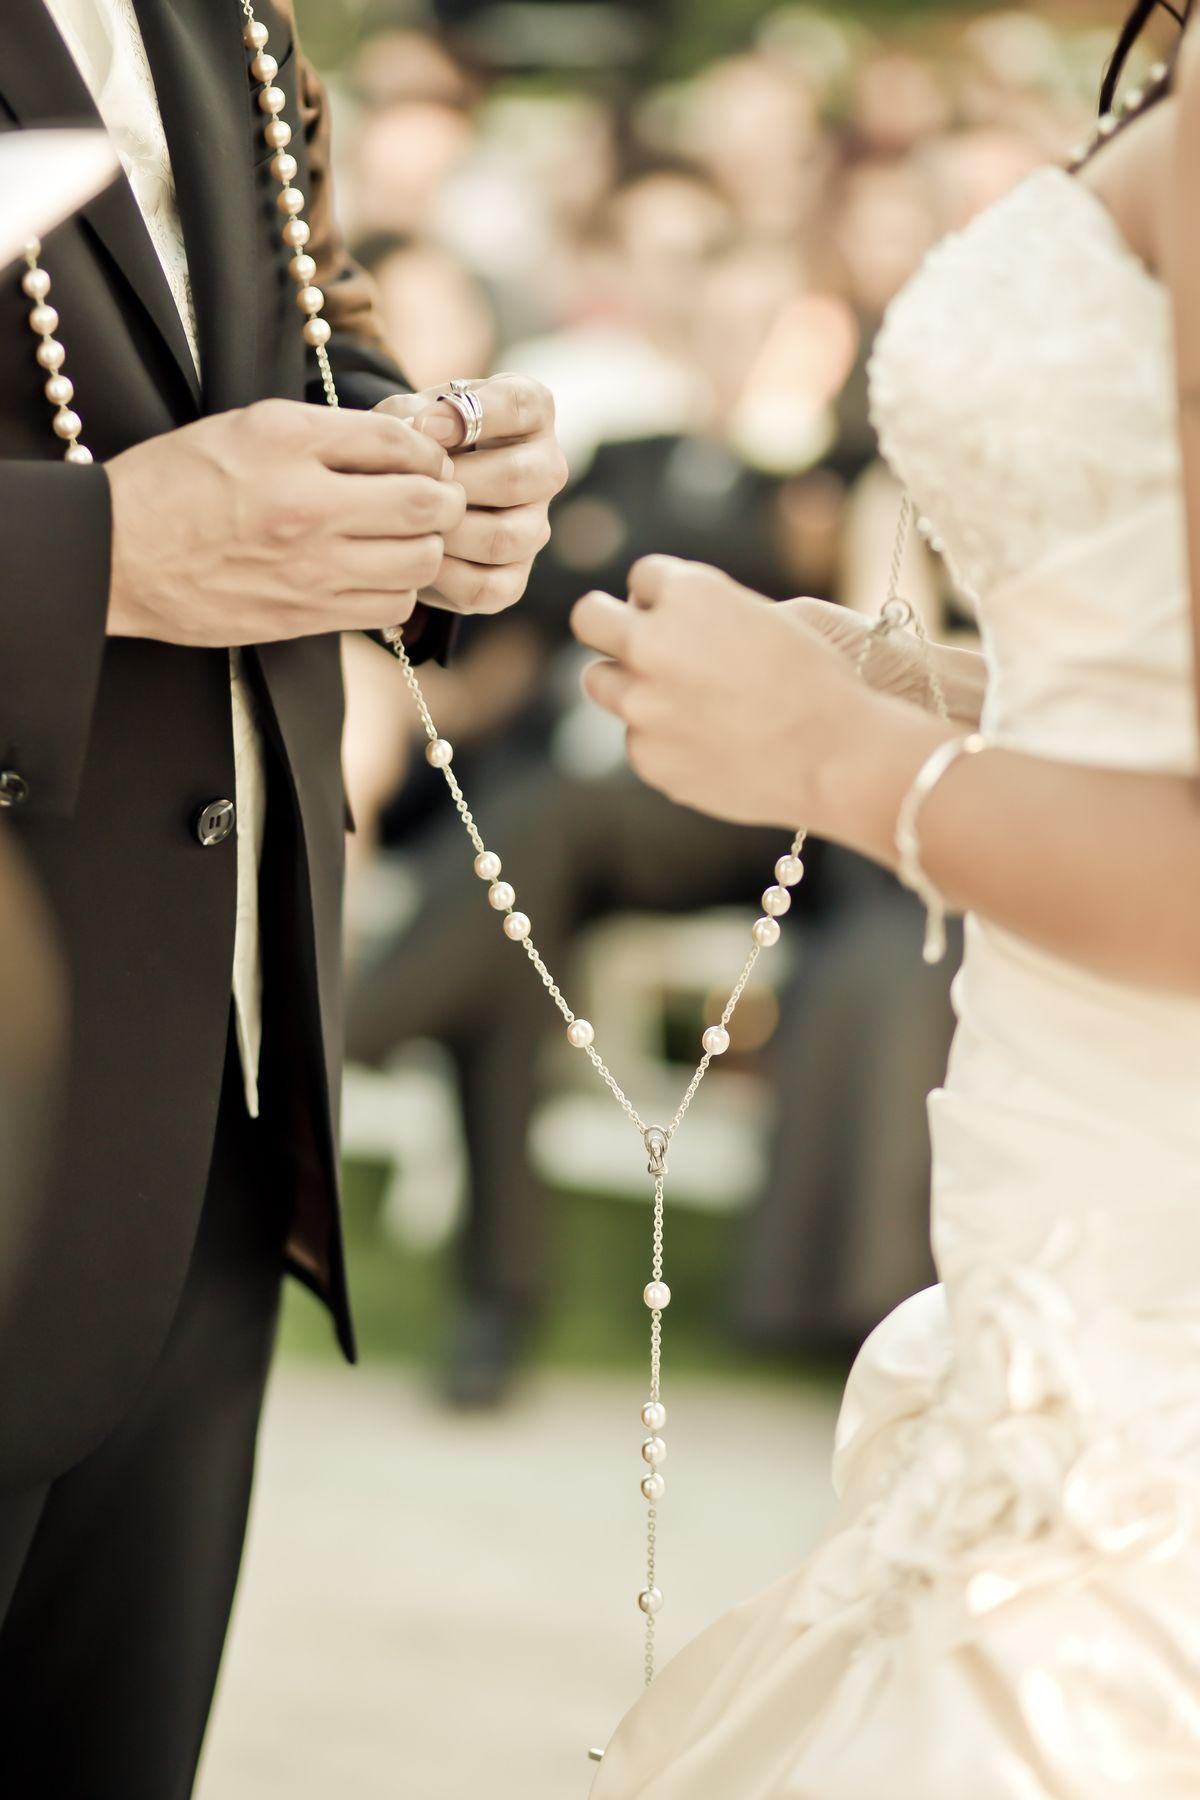 El lazo( hispanic wedding) Lazo de boda, Tradiciones